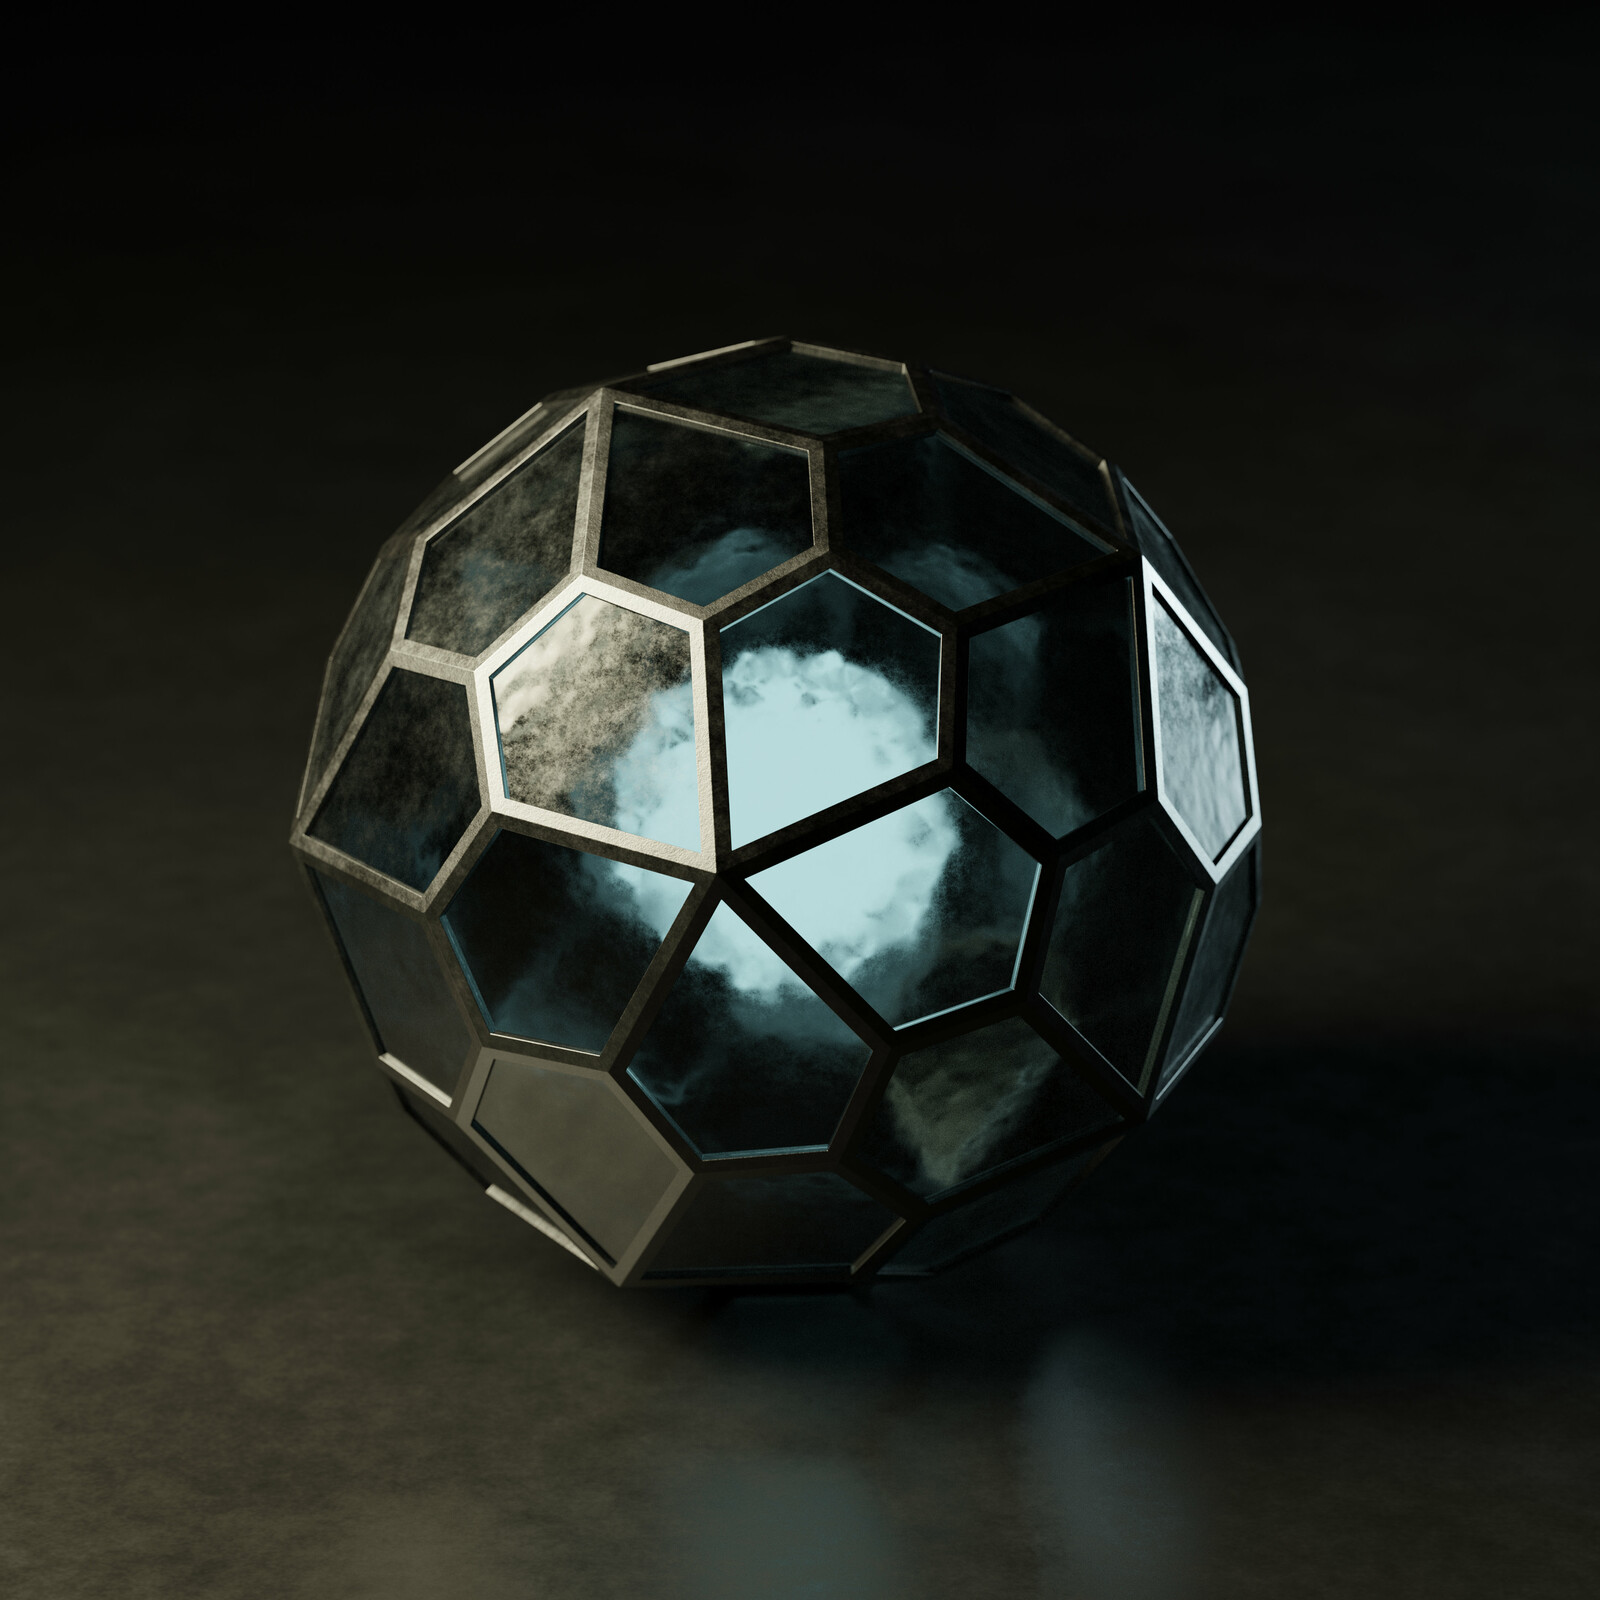 Pentagonal Hexecontahedron v2